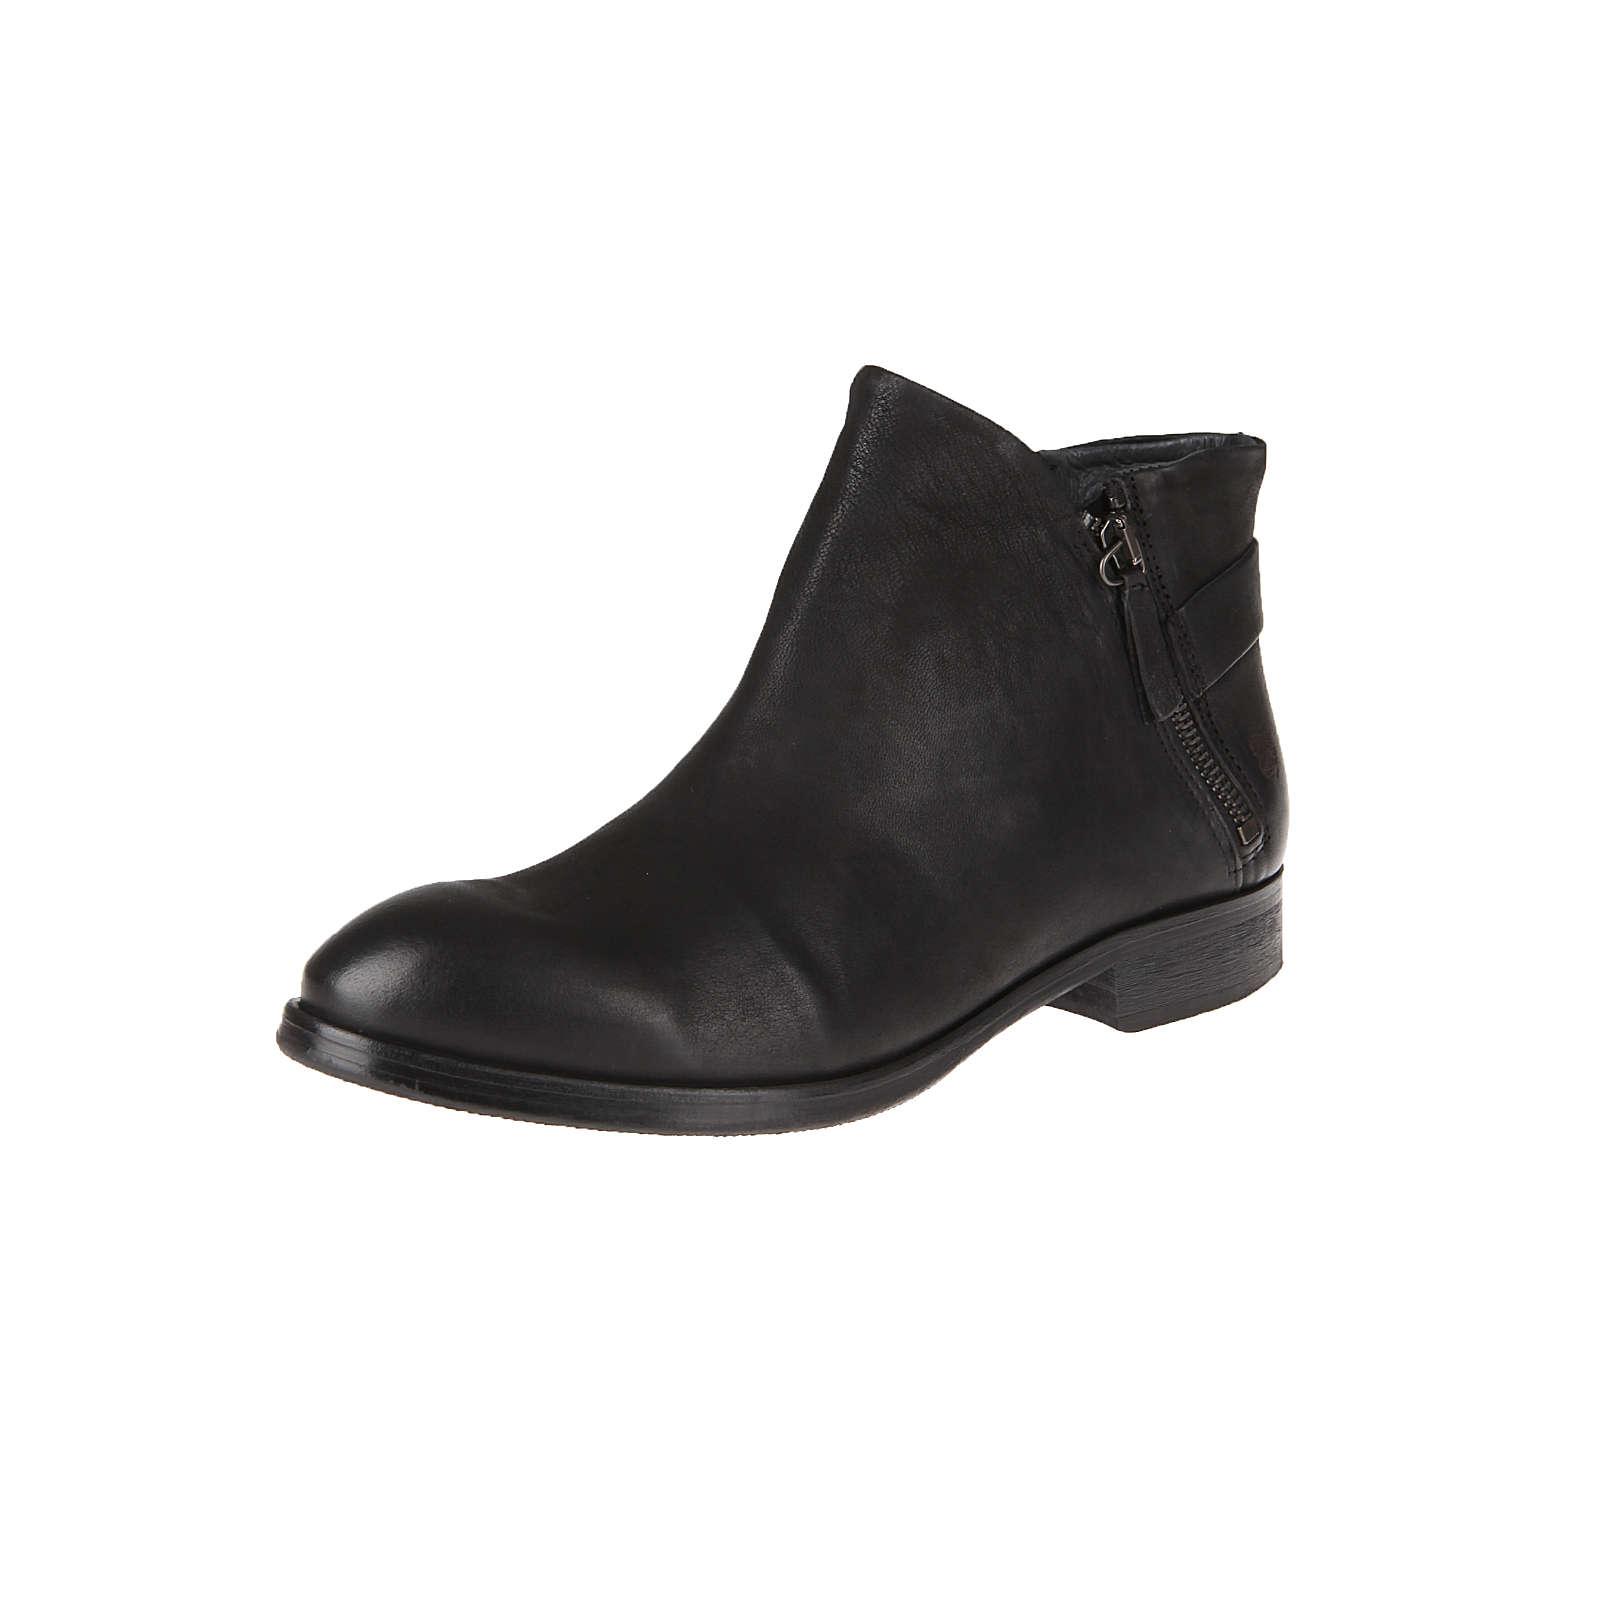 Apple of Eden Ankle-Boots BERTA Ankle Boots schwarz Damen Gr. 39